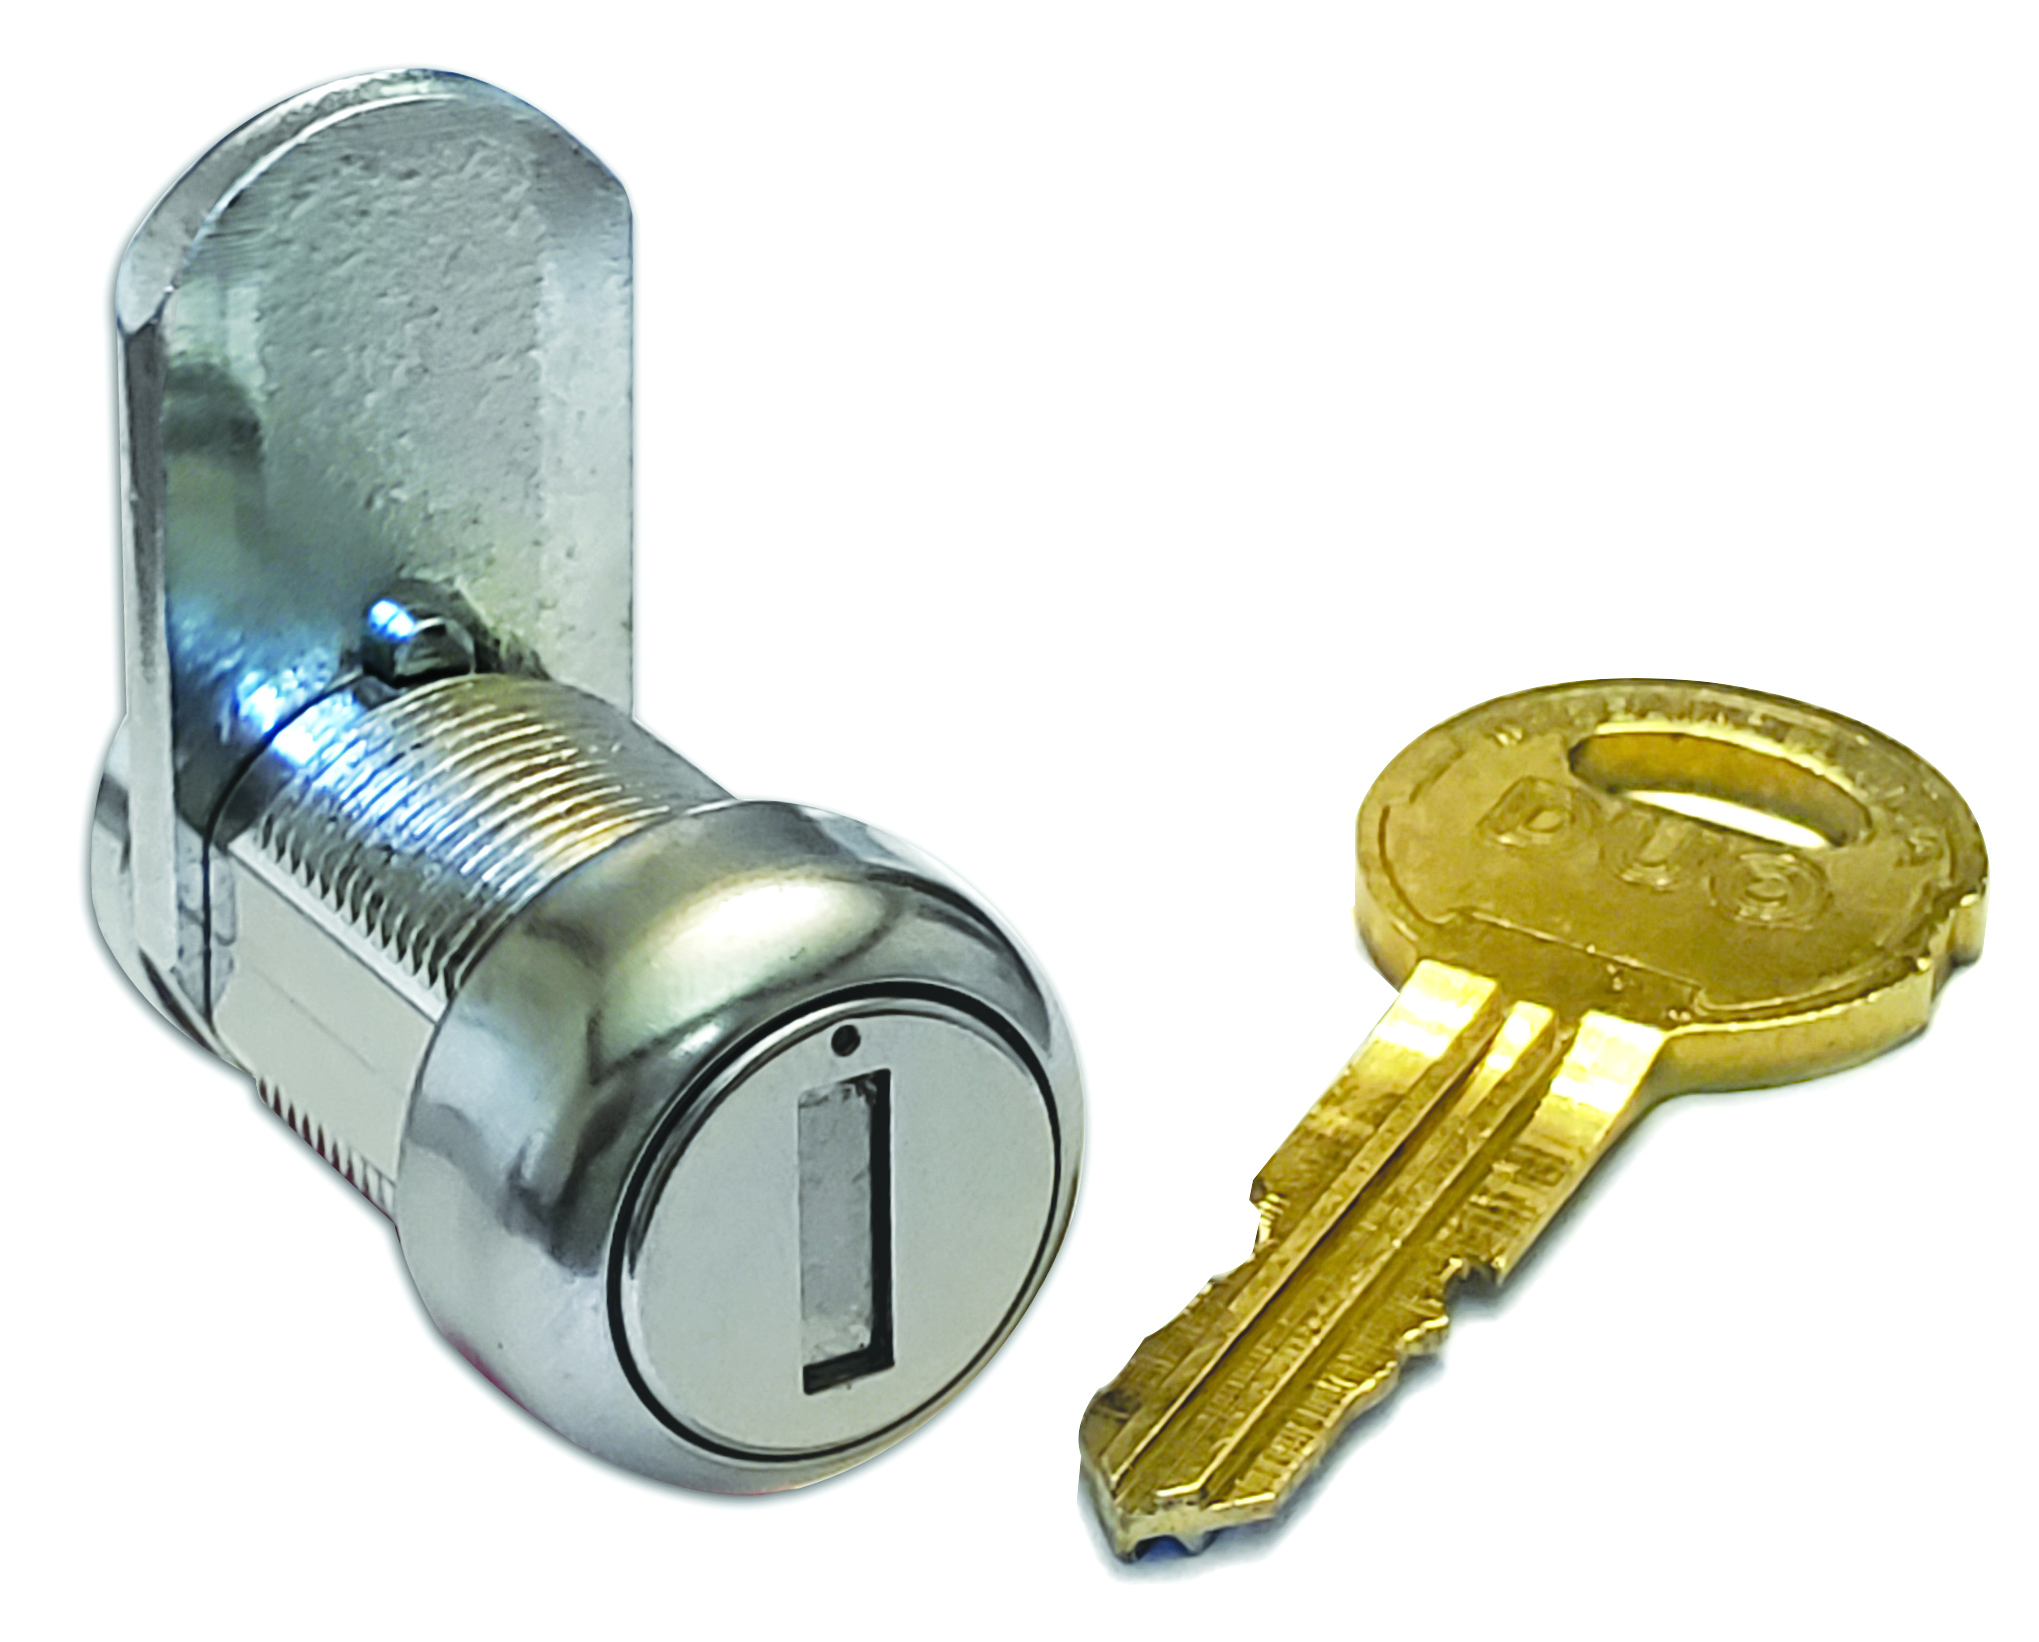 IP66 Rated, 643 Duo Series Fourteen tumbler, weather resistant cam lock 64361